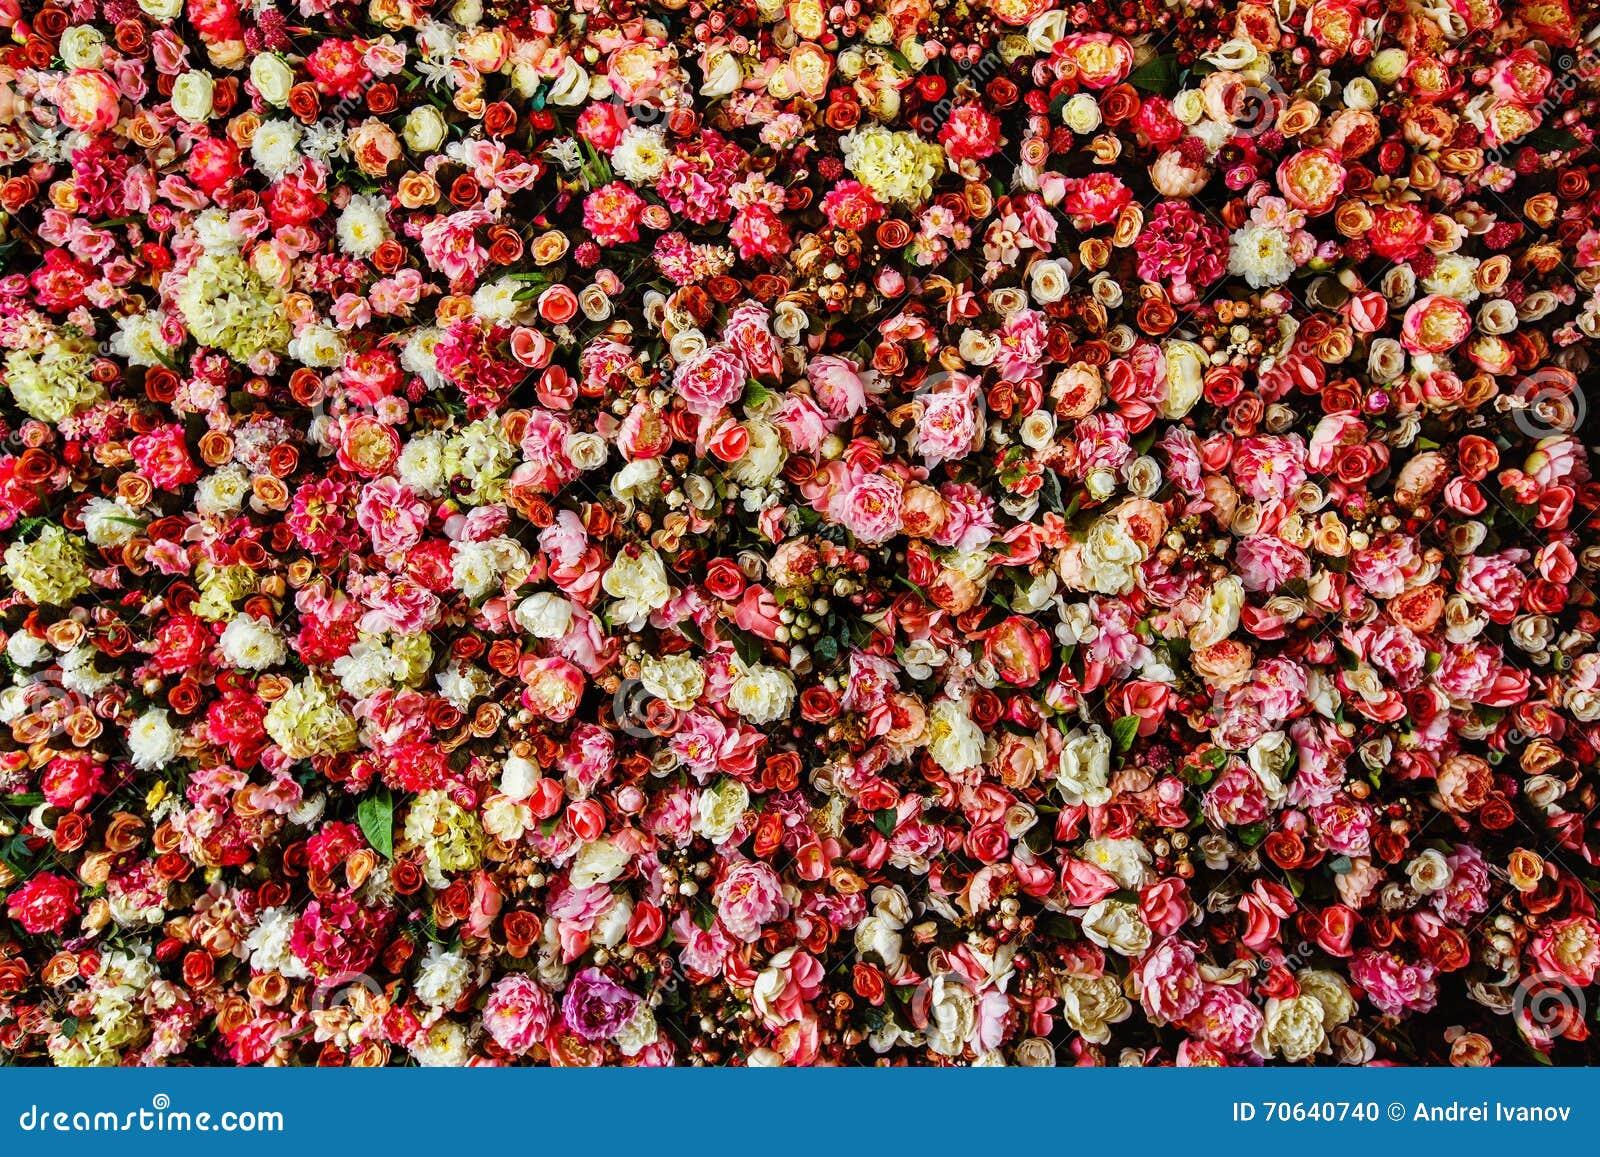 Closeup image of beautiful flowers wall background stock photo closeup image of beautiful flowers wall background izmirmasajfo